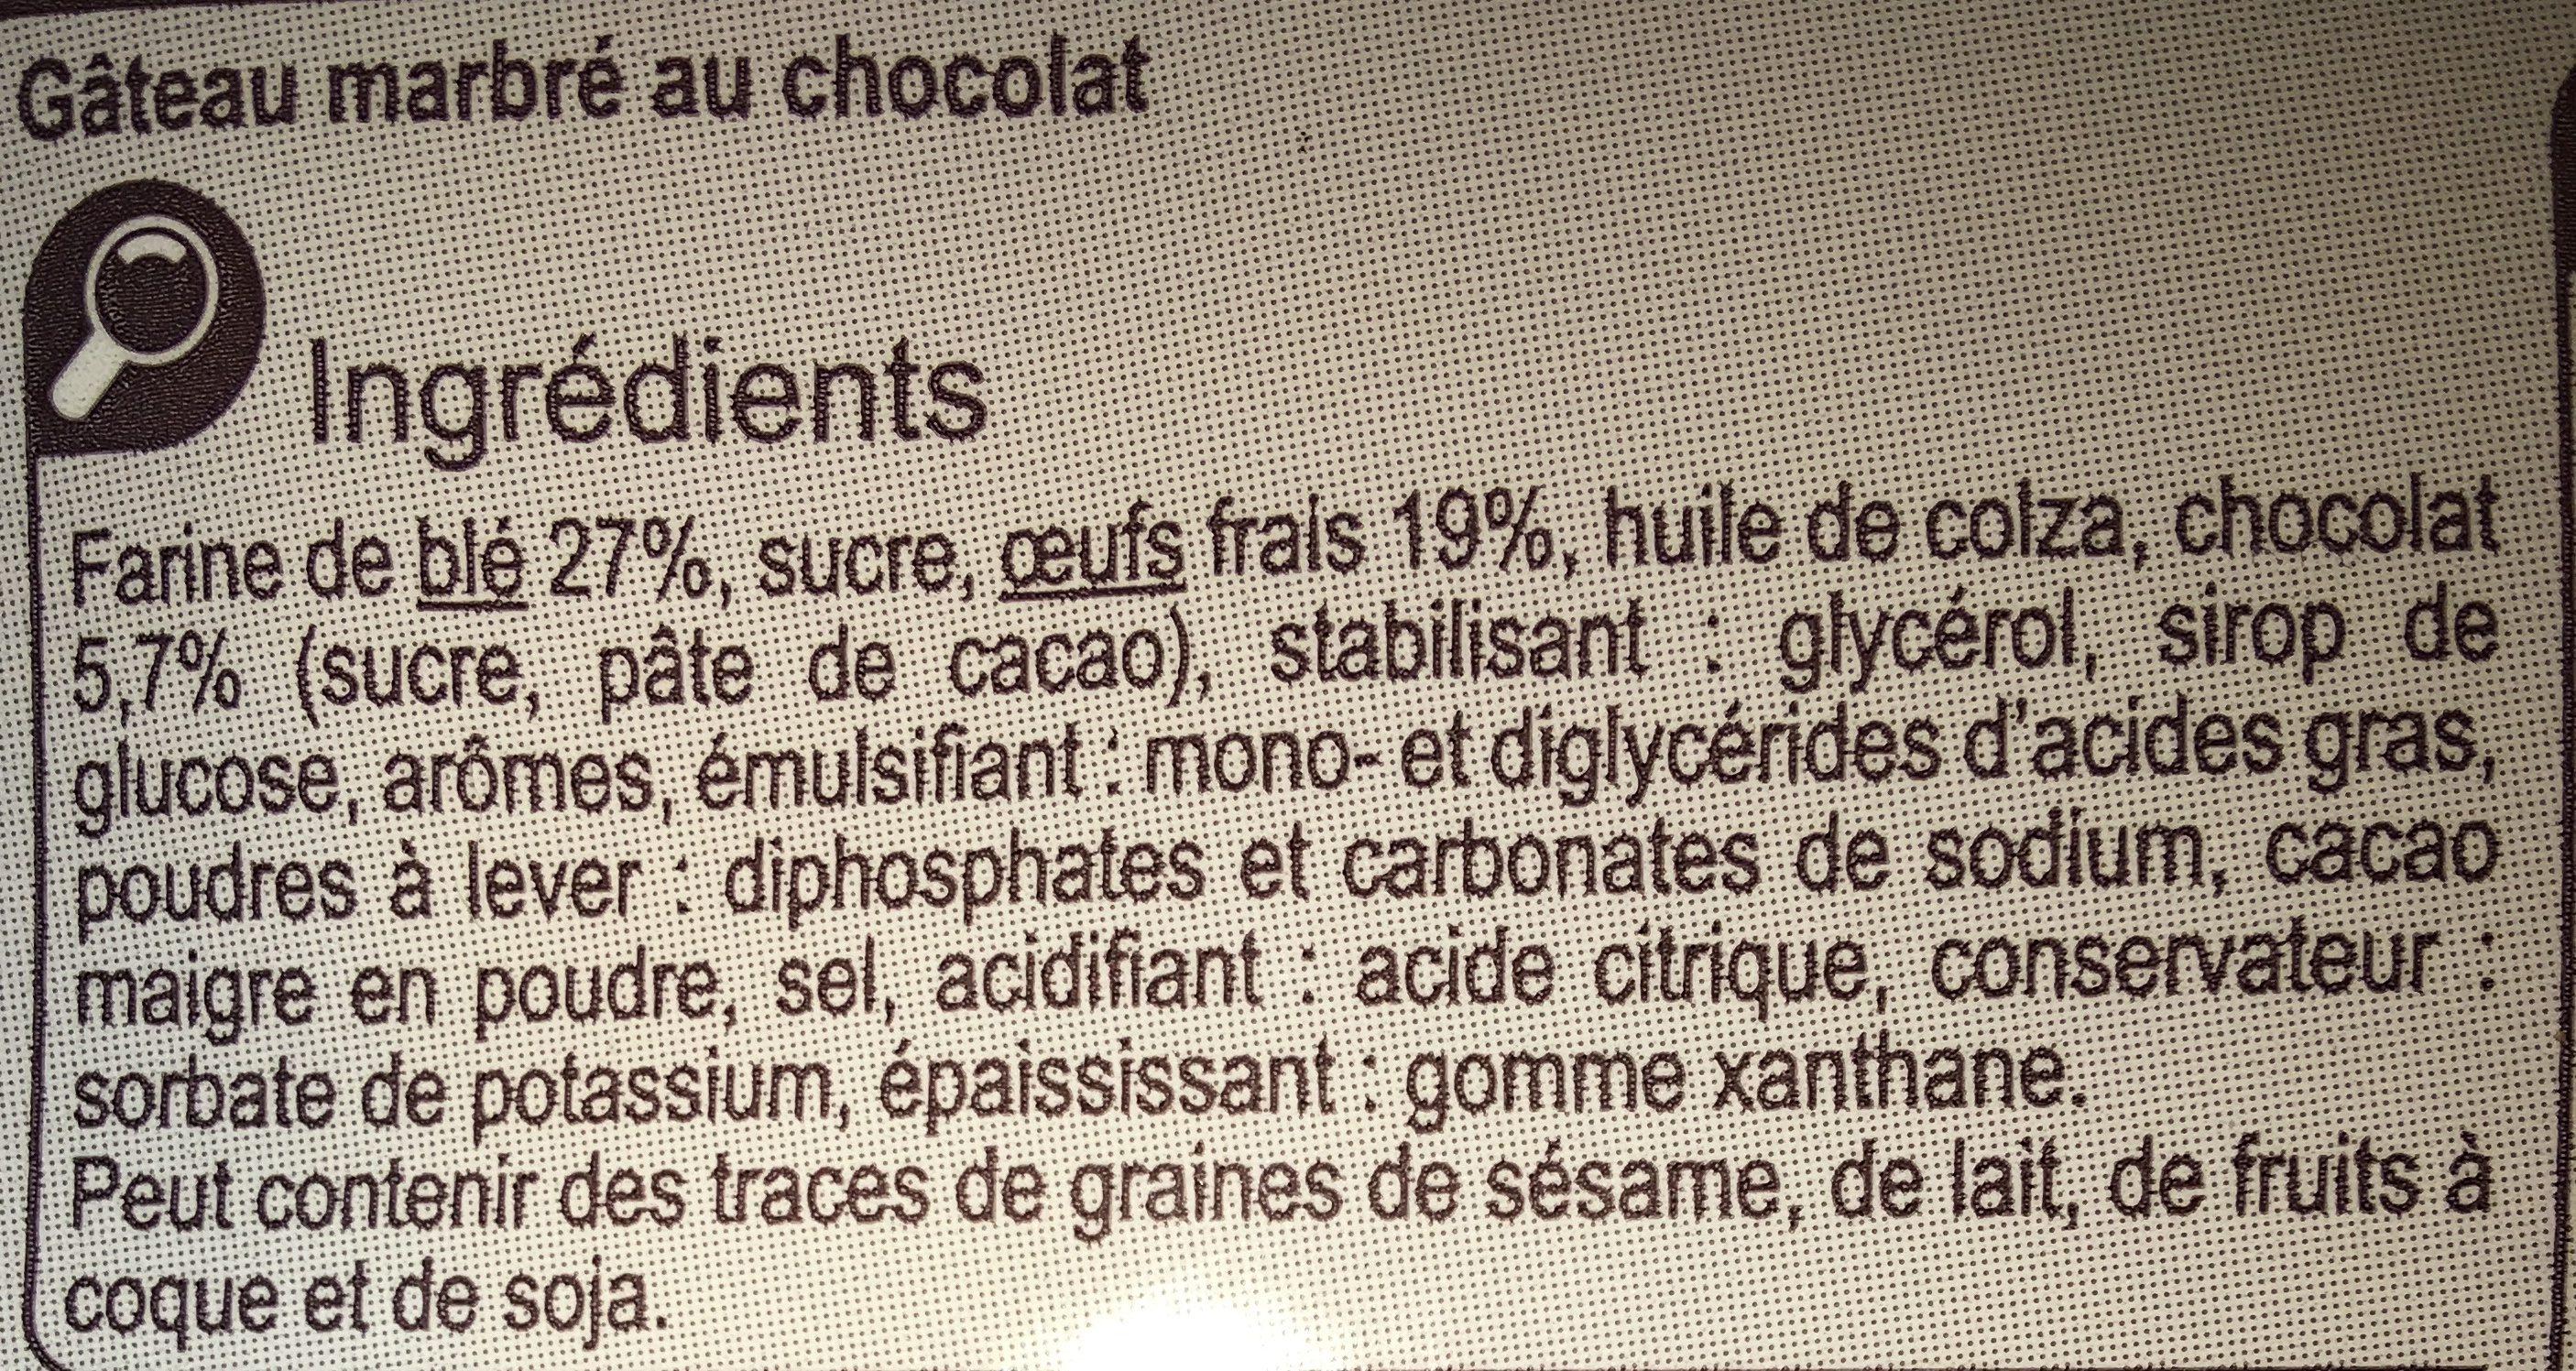 Gâteau marbré au chocolat - Ingrediënten - fr